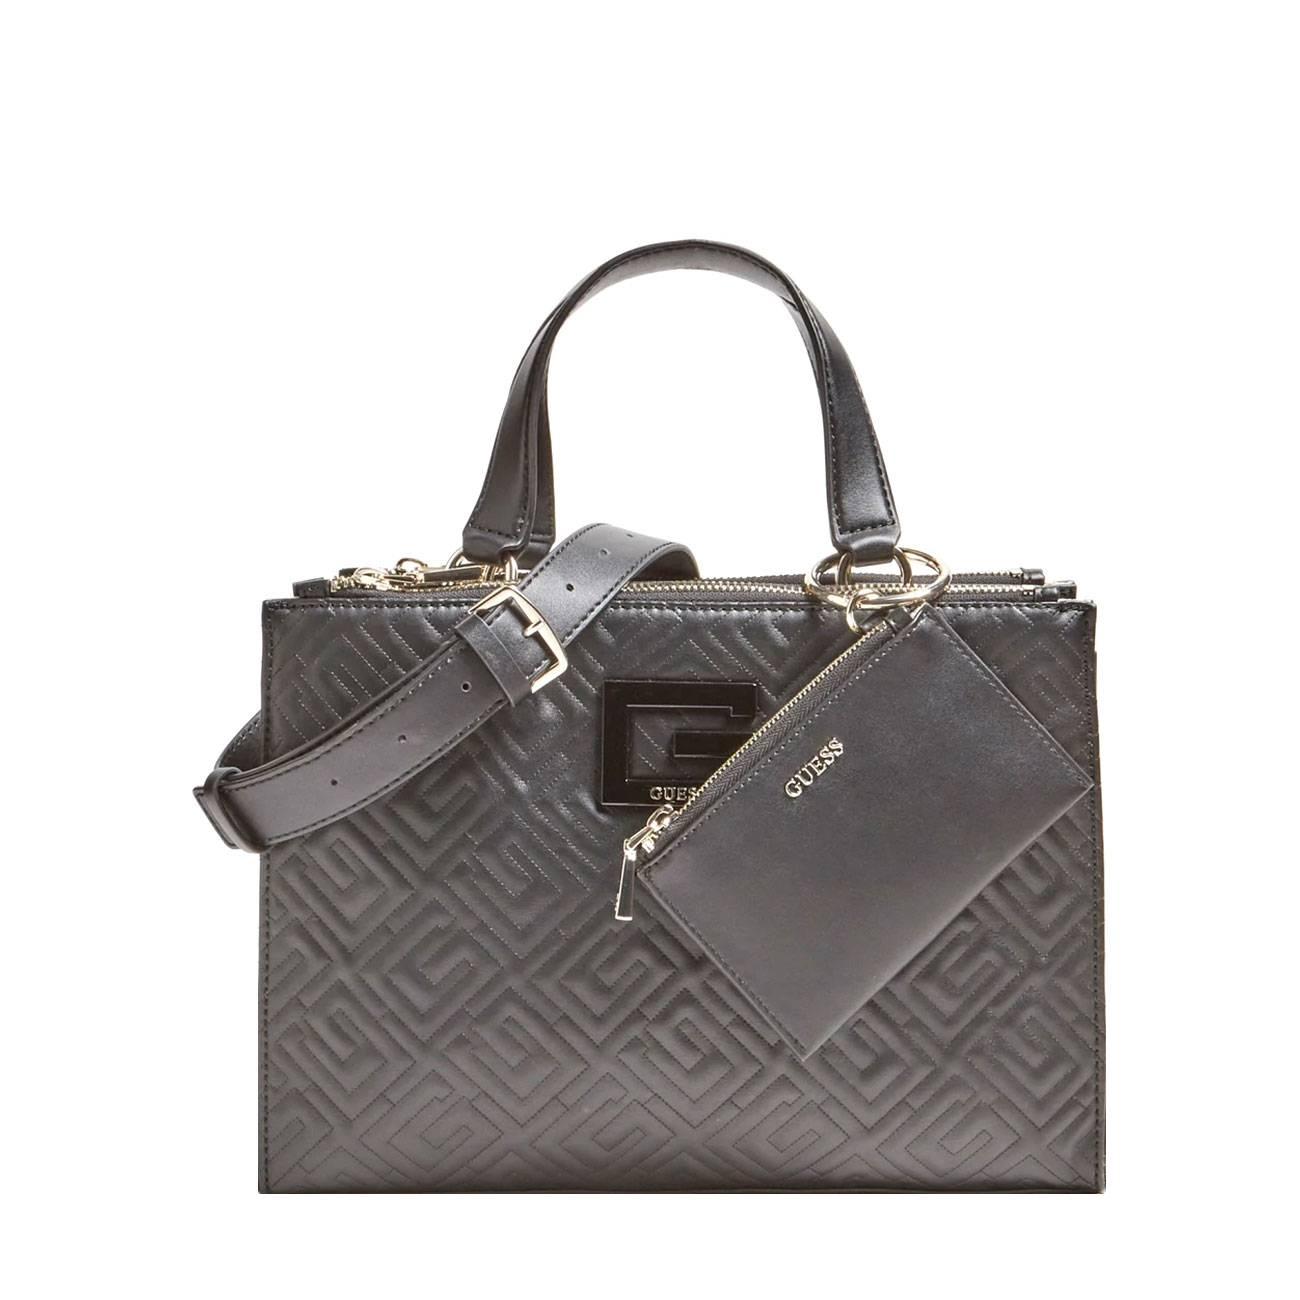 Janay Quilted Handbag